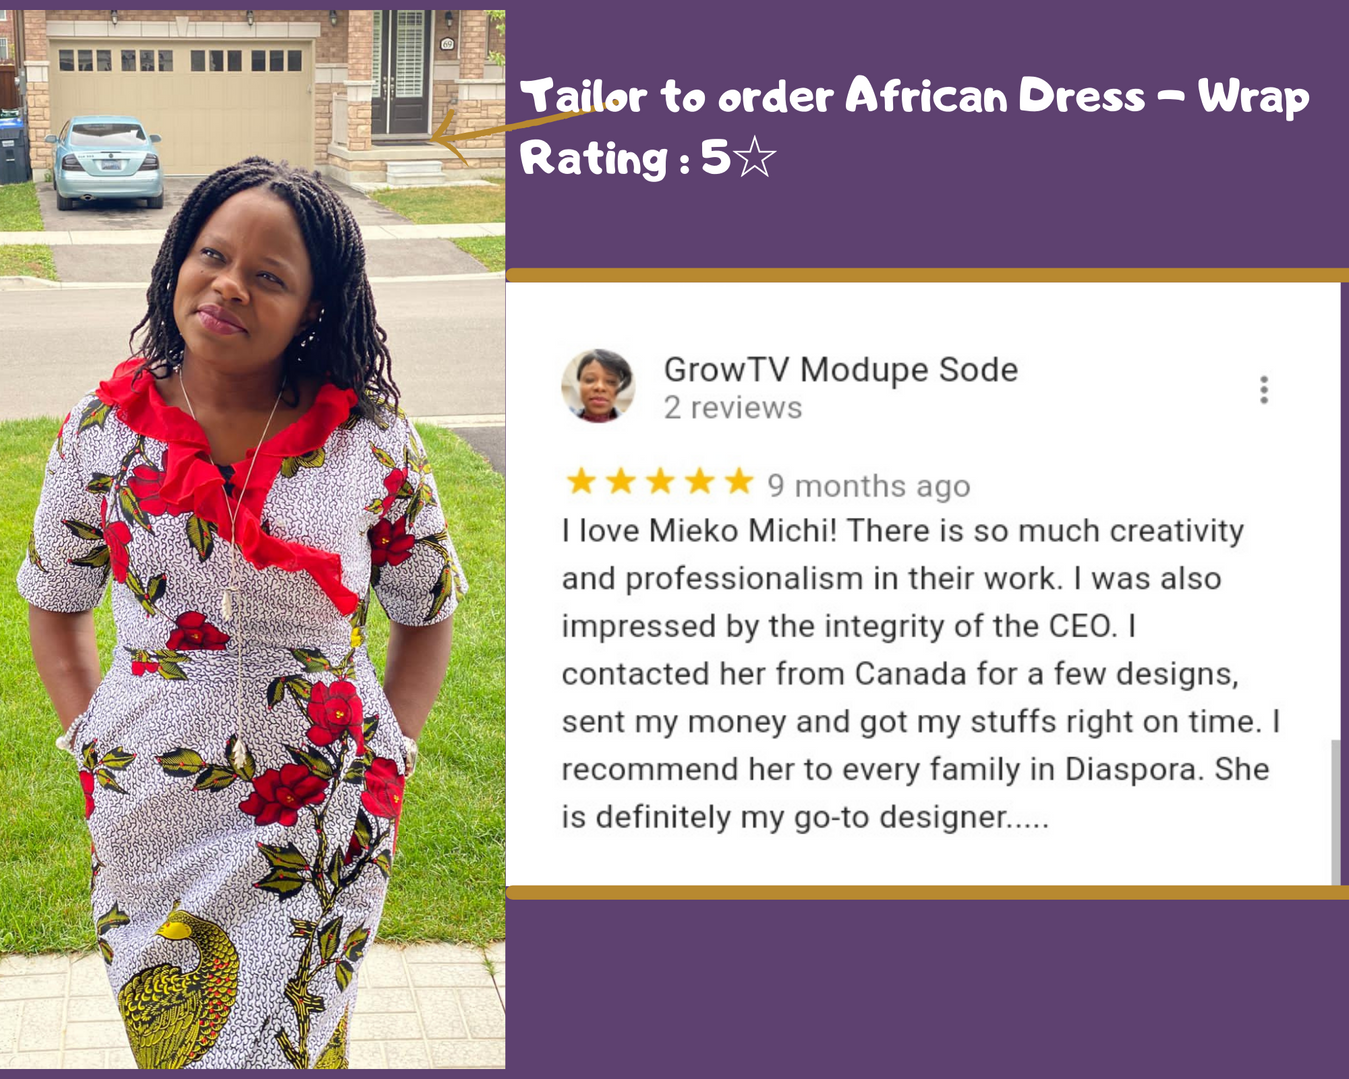 Mieko_Michi_Review_Wrap_African_Dress_Cu